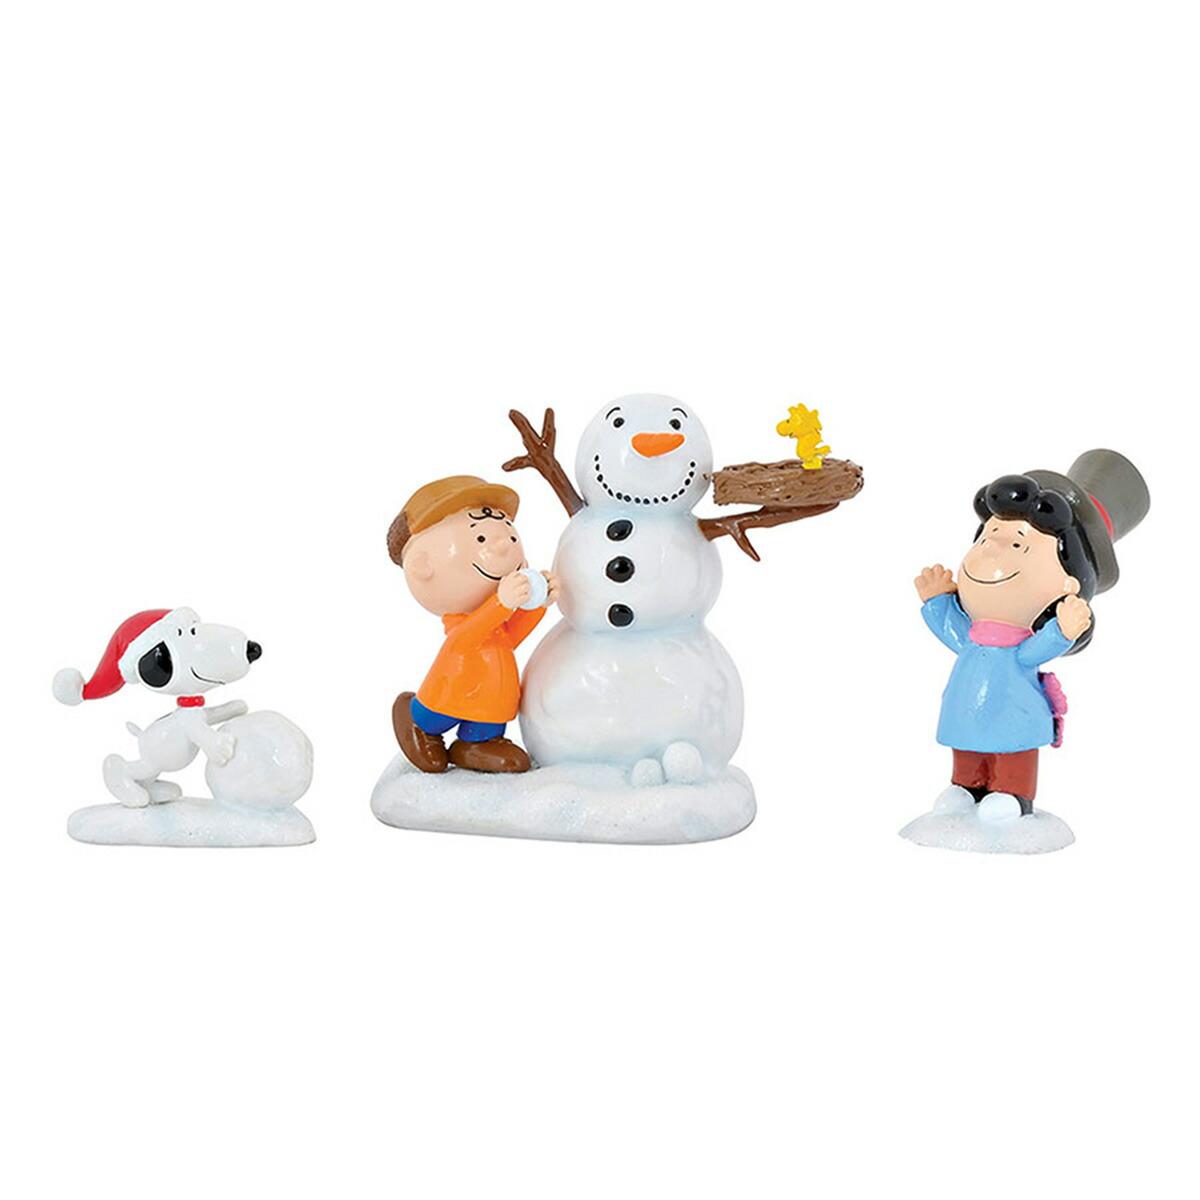 Department 56 デパートメント56 フィギュア スヌーピー スノーマン セット 4057052 クリスマス 置物 飾り ディスプレイ インテリア 雑貨 プレゼント ギフト 雪だるま